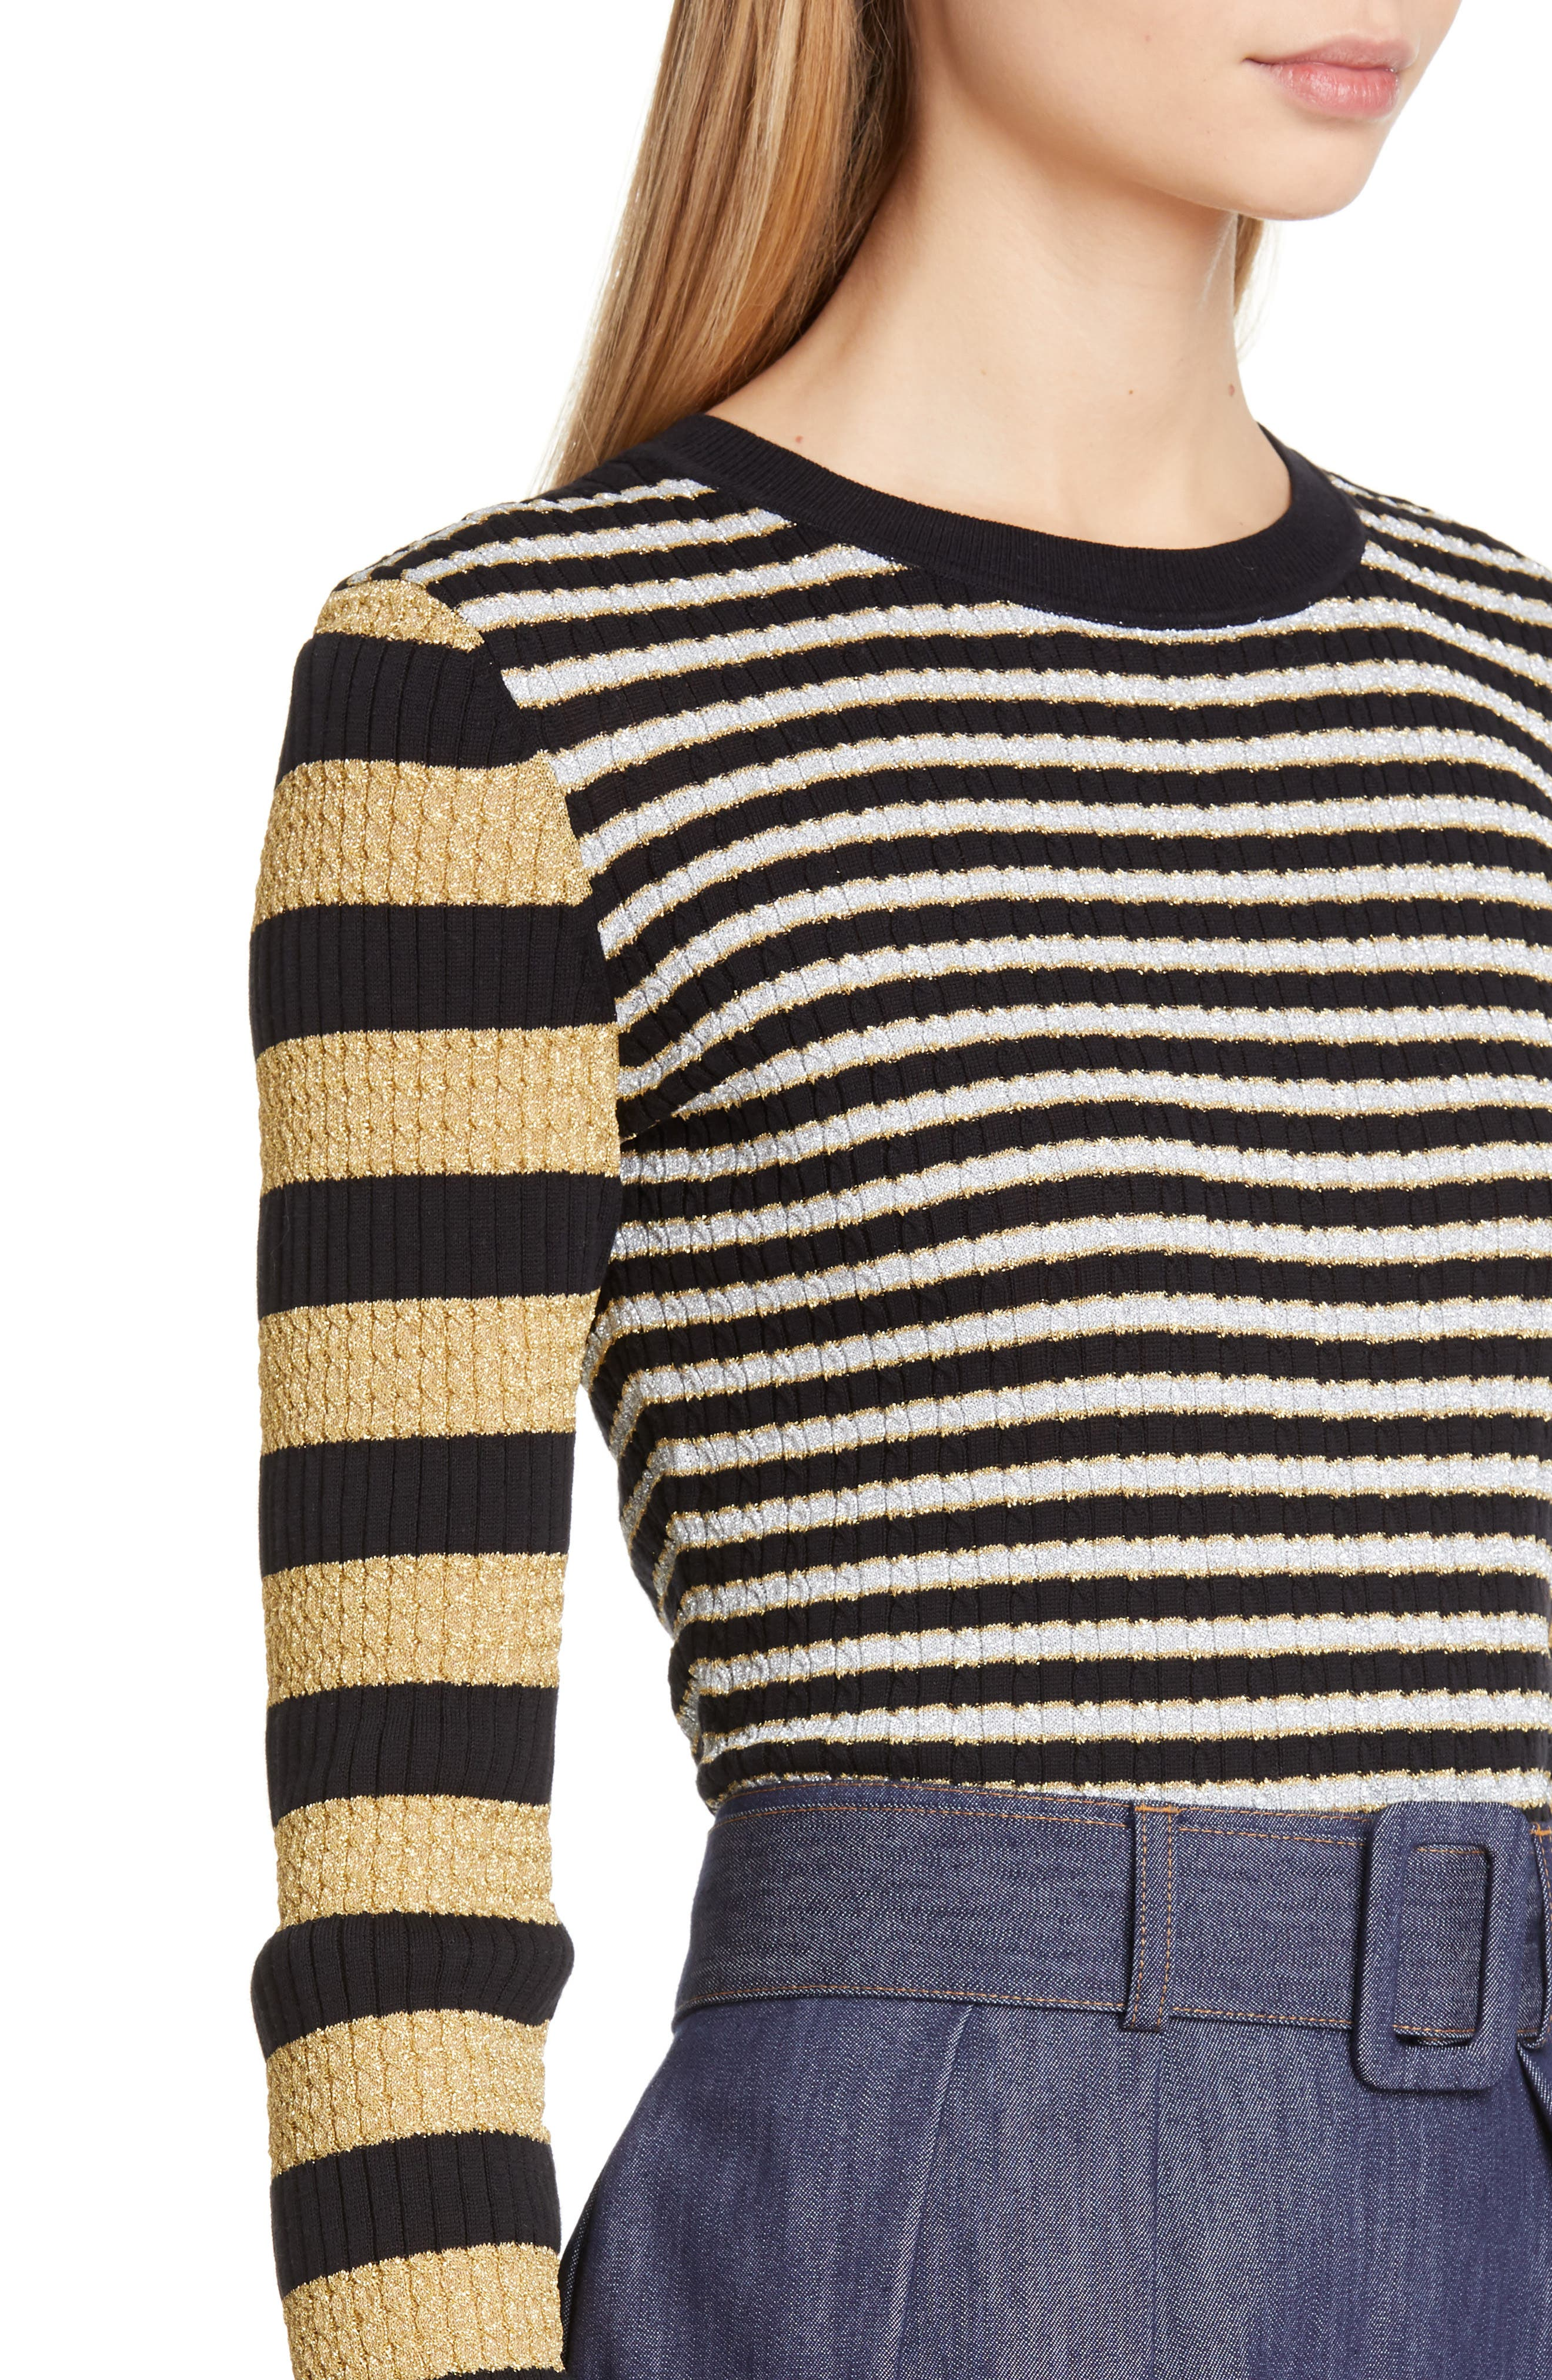 TOMMY X ZENDAYA, Metallic Stripe Knit Top, Alternate thumbnail 4, color, BLACK BEAUTY MULTI